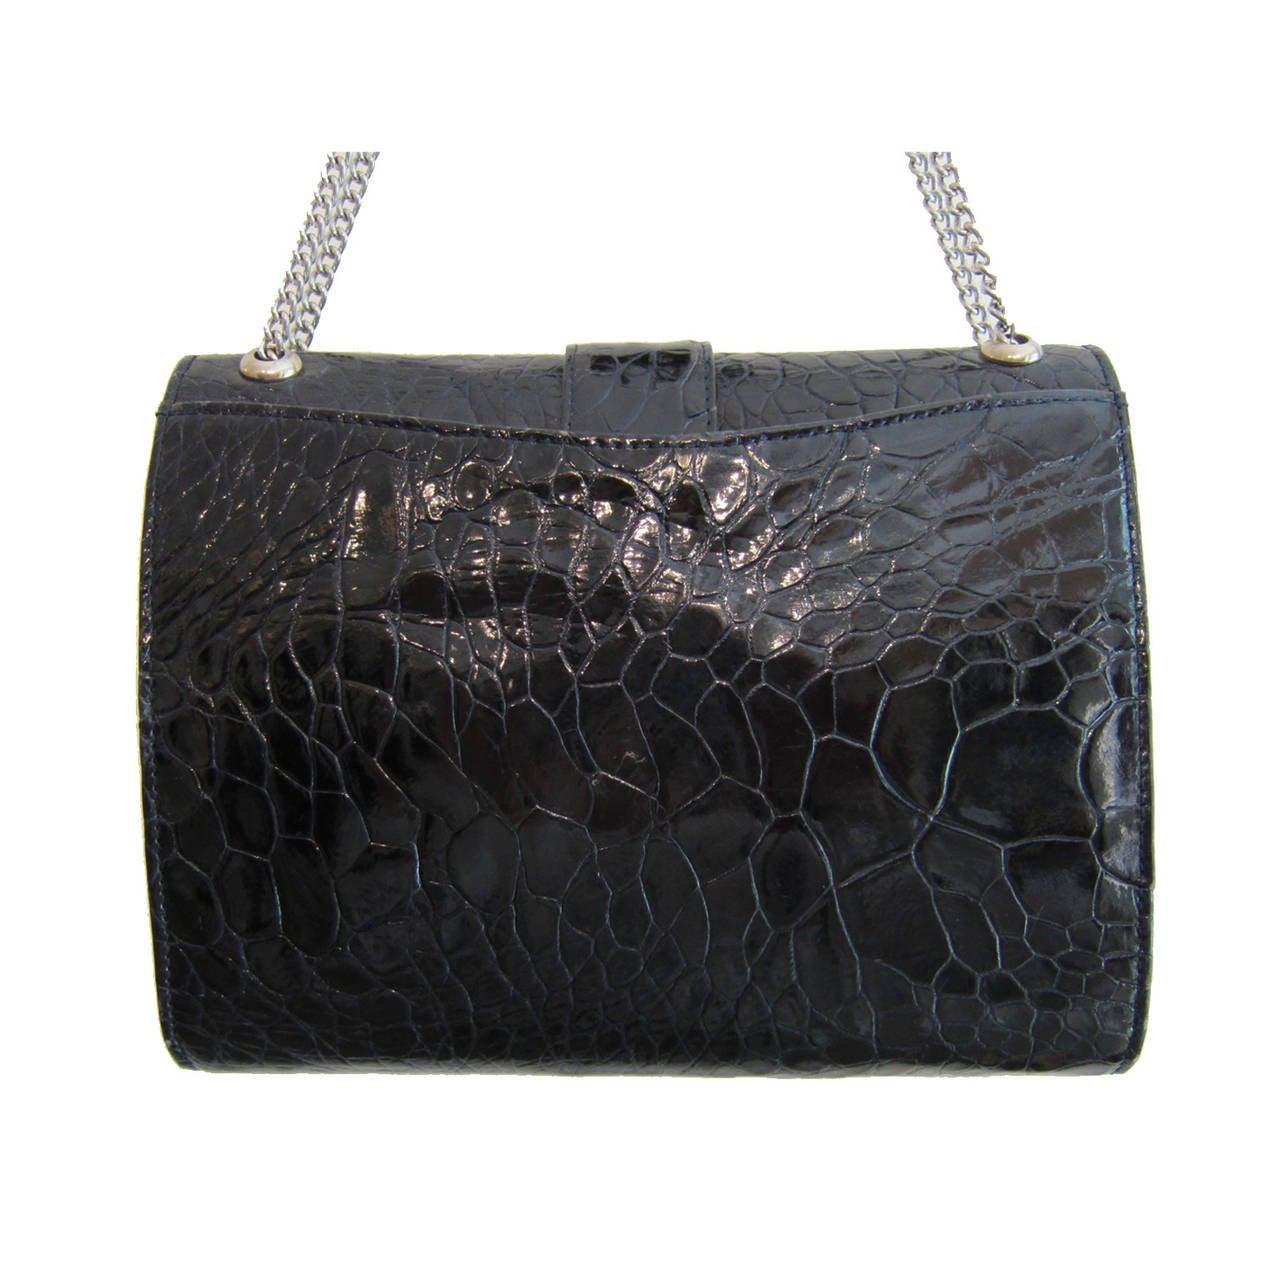 1stdibs Modell Royal Black Crocodile Shoulder Chain Bag 1960s zyS04K4dJ